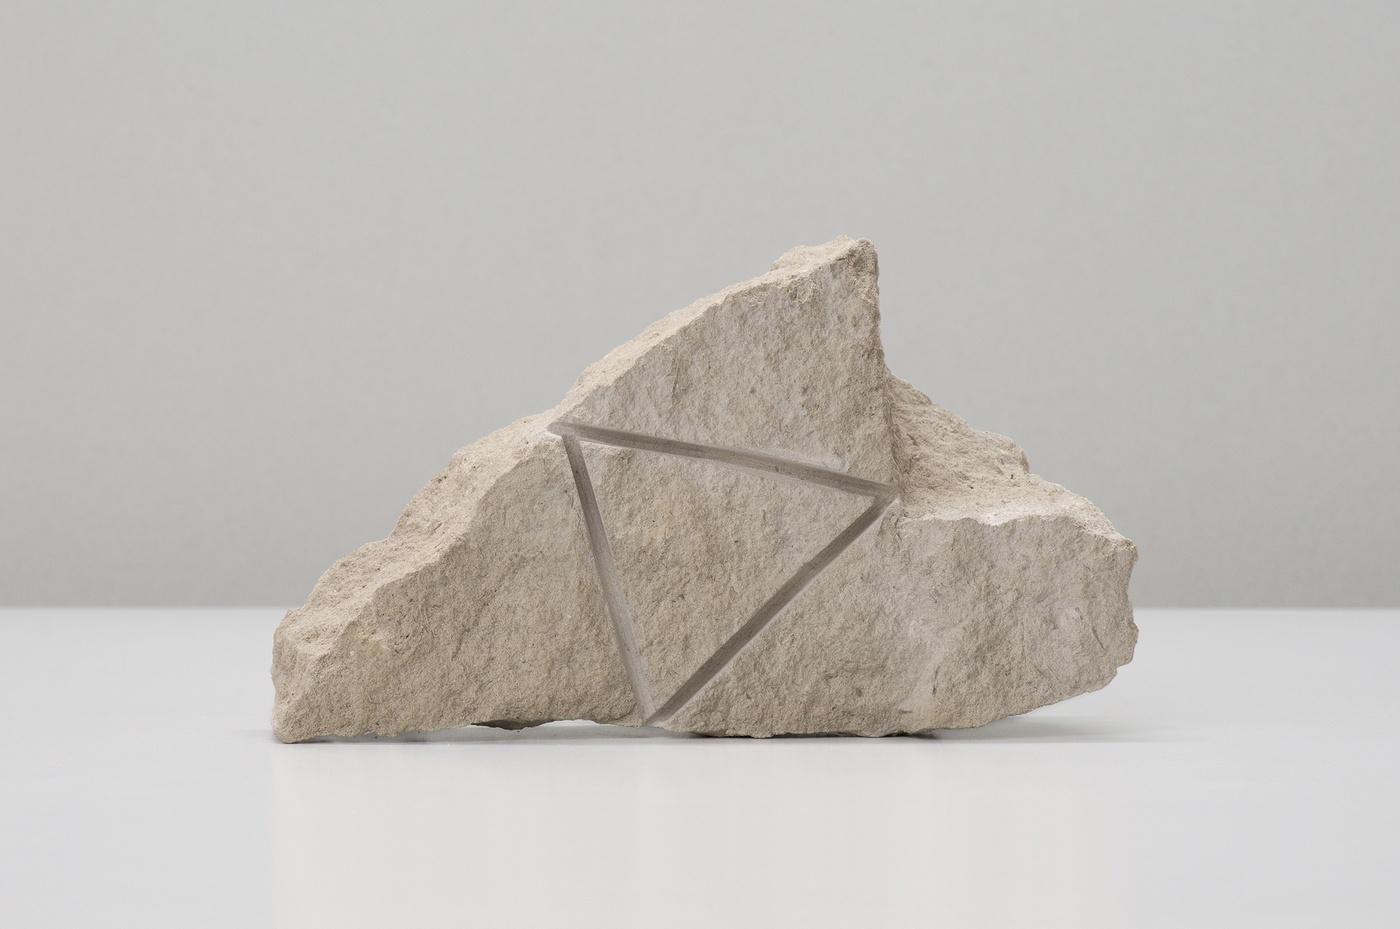 Stone carving, 1973, limestone, 3 1/2 x 11 3/8 x 6 3/4 in / 8.9 x 29 x 17 cm